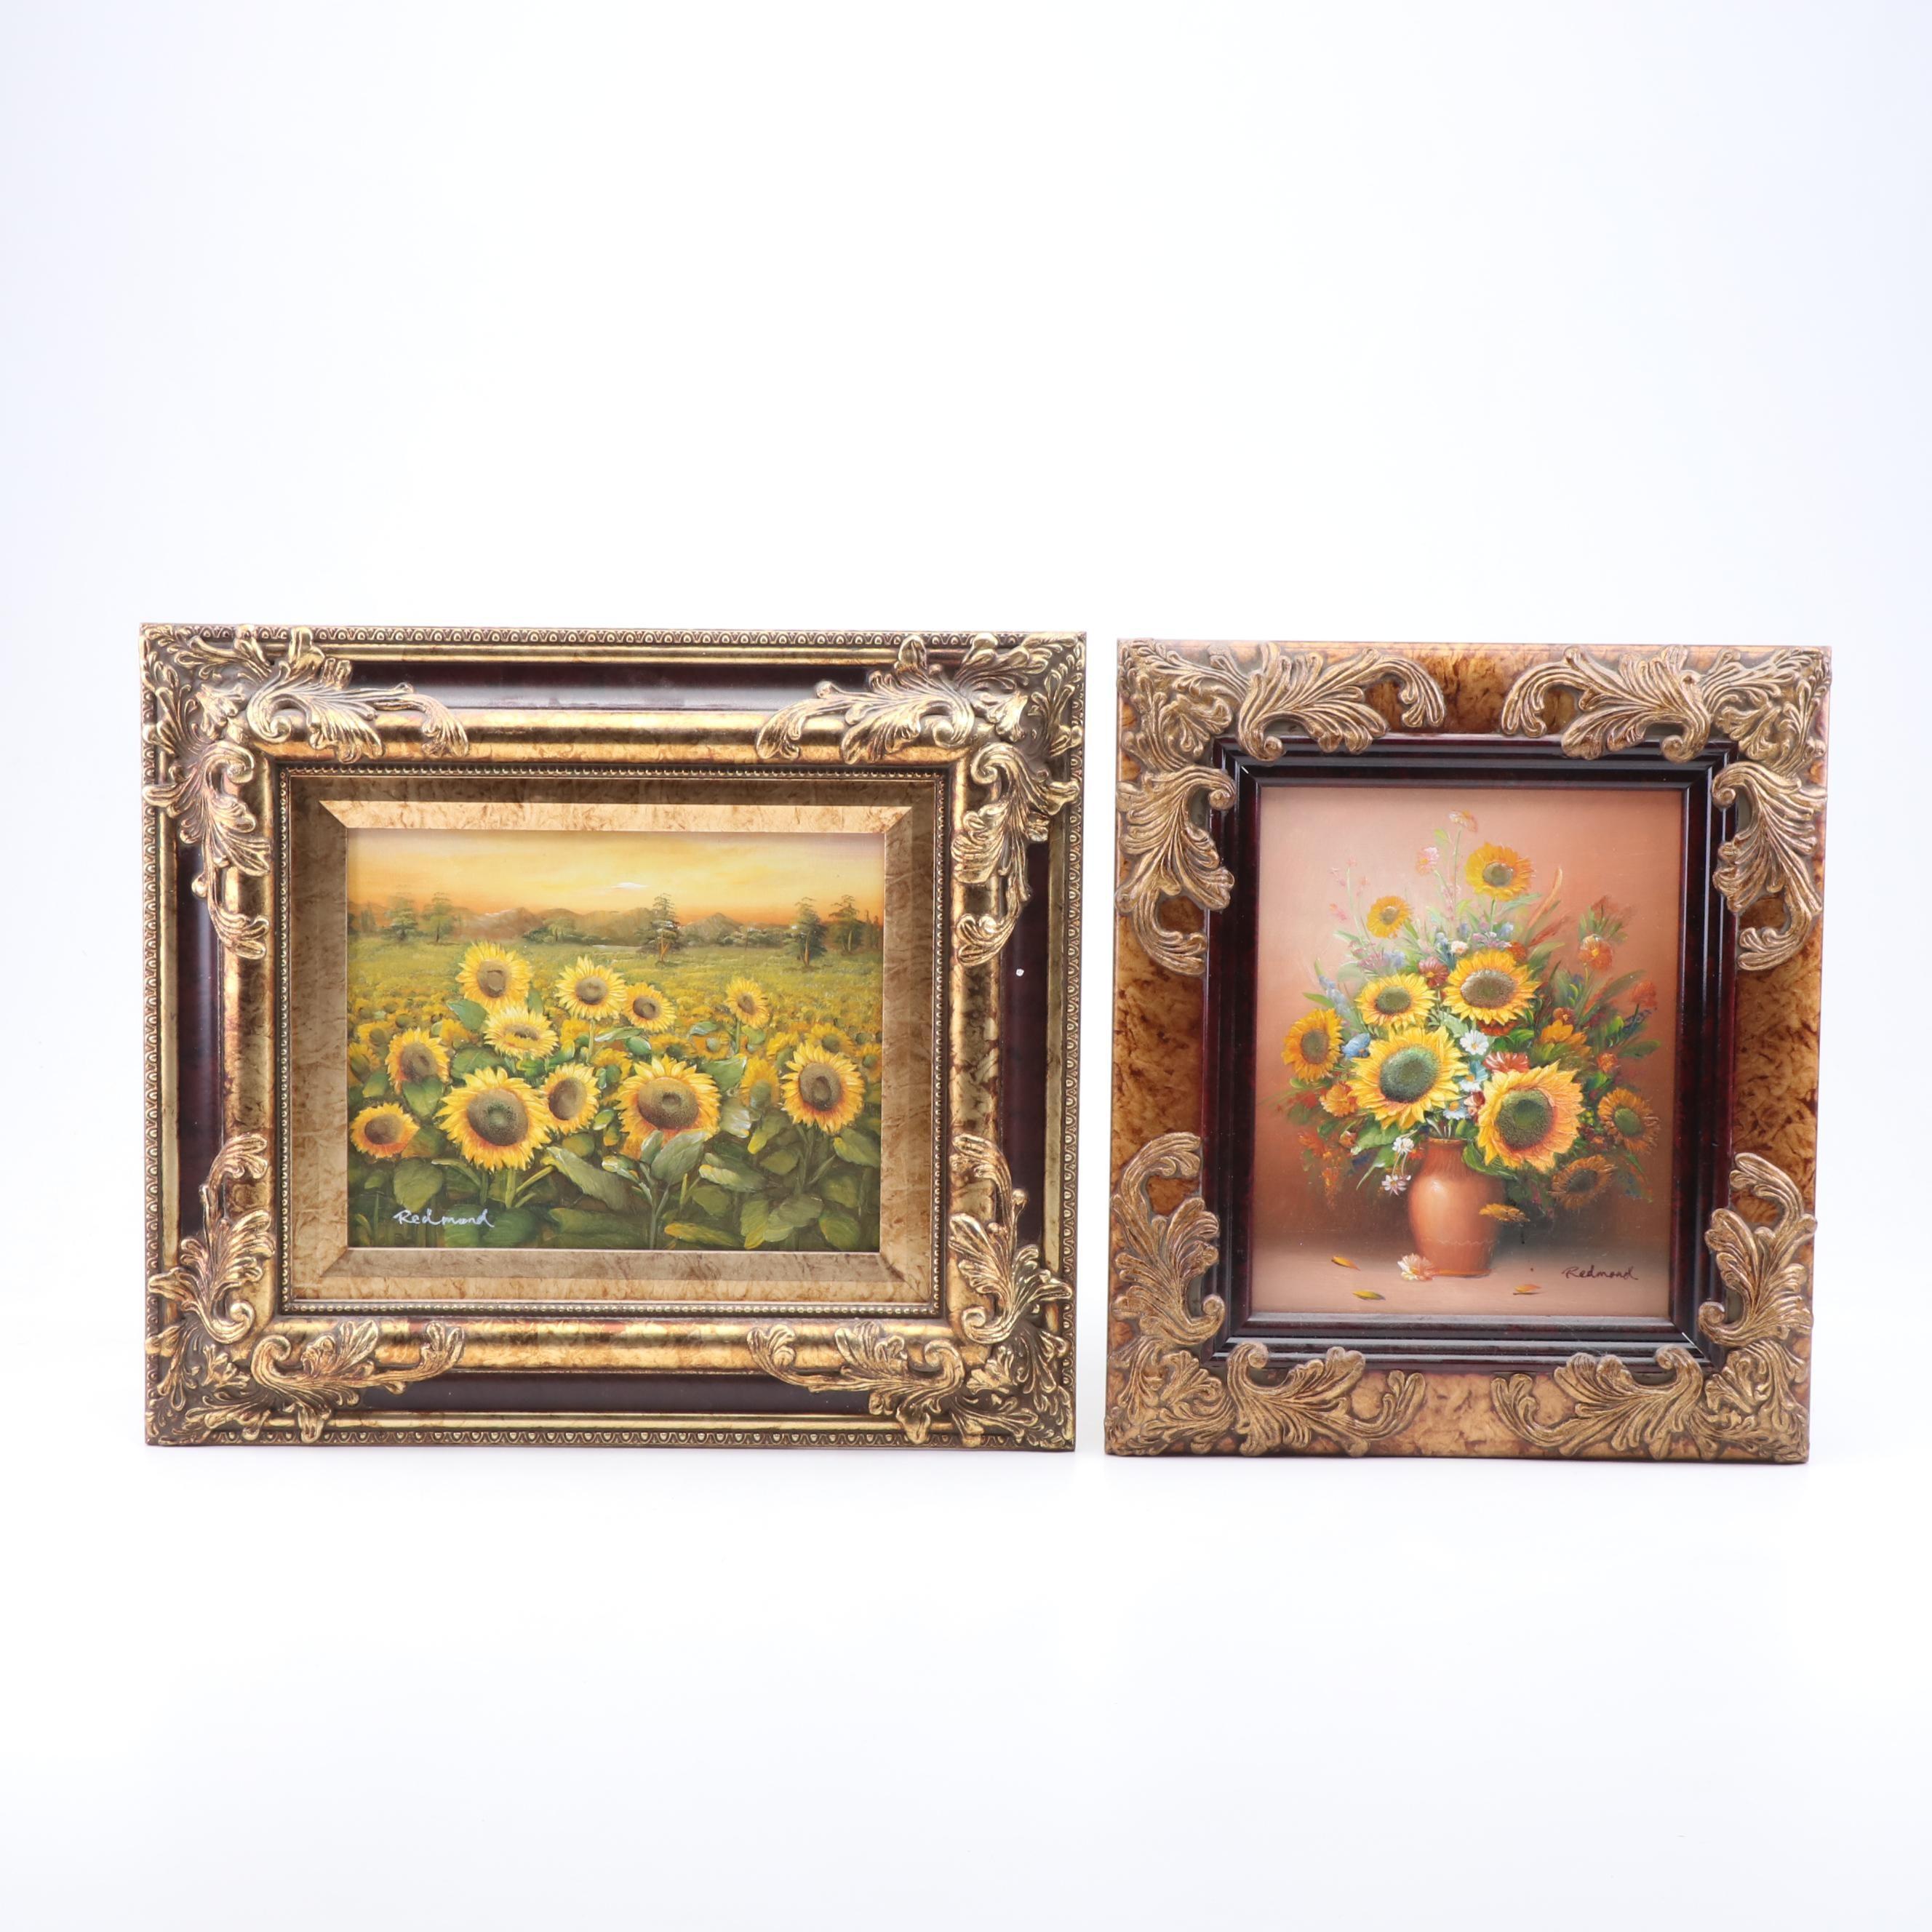 Redmond Still Life Oil Paintings of Sunflowers